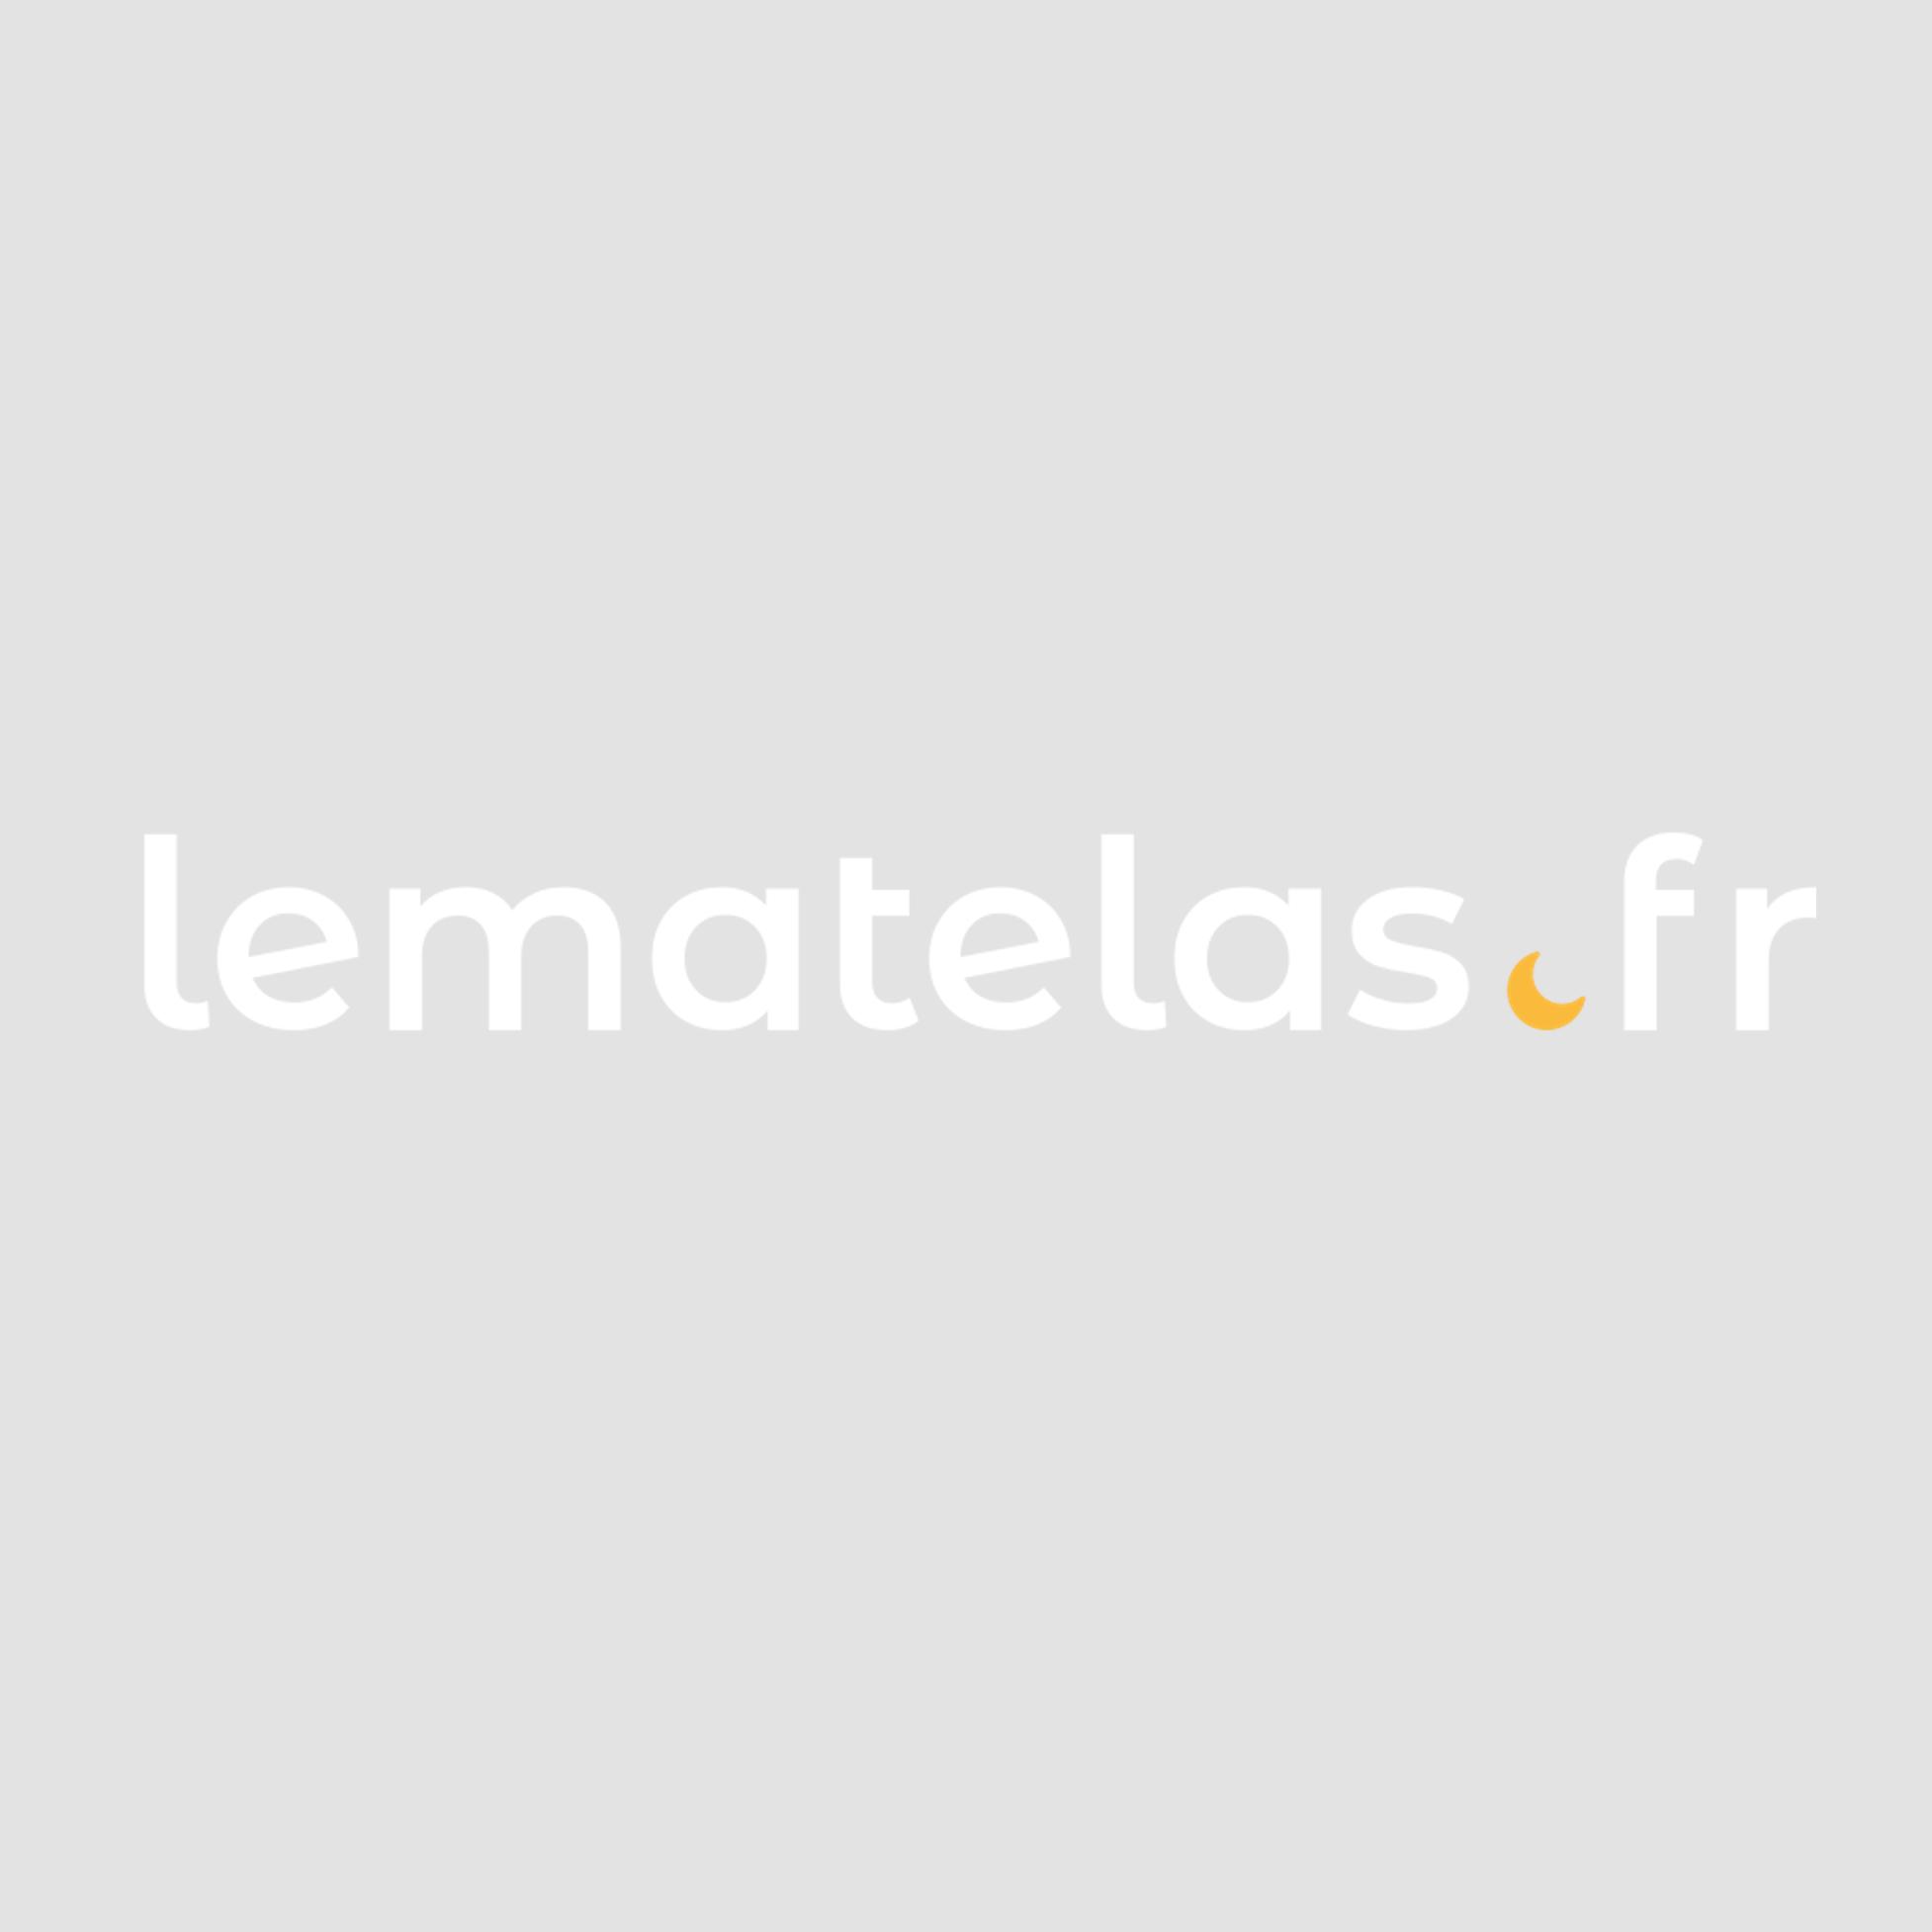 Banquette ajustable en pin massif blanc matelas jaune inclus 75x200